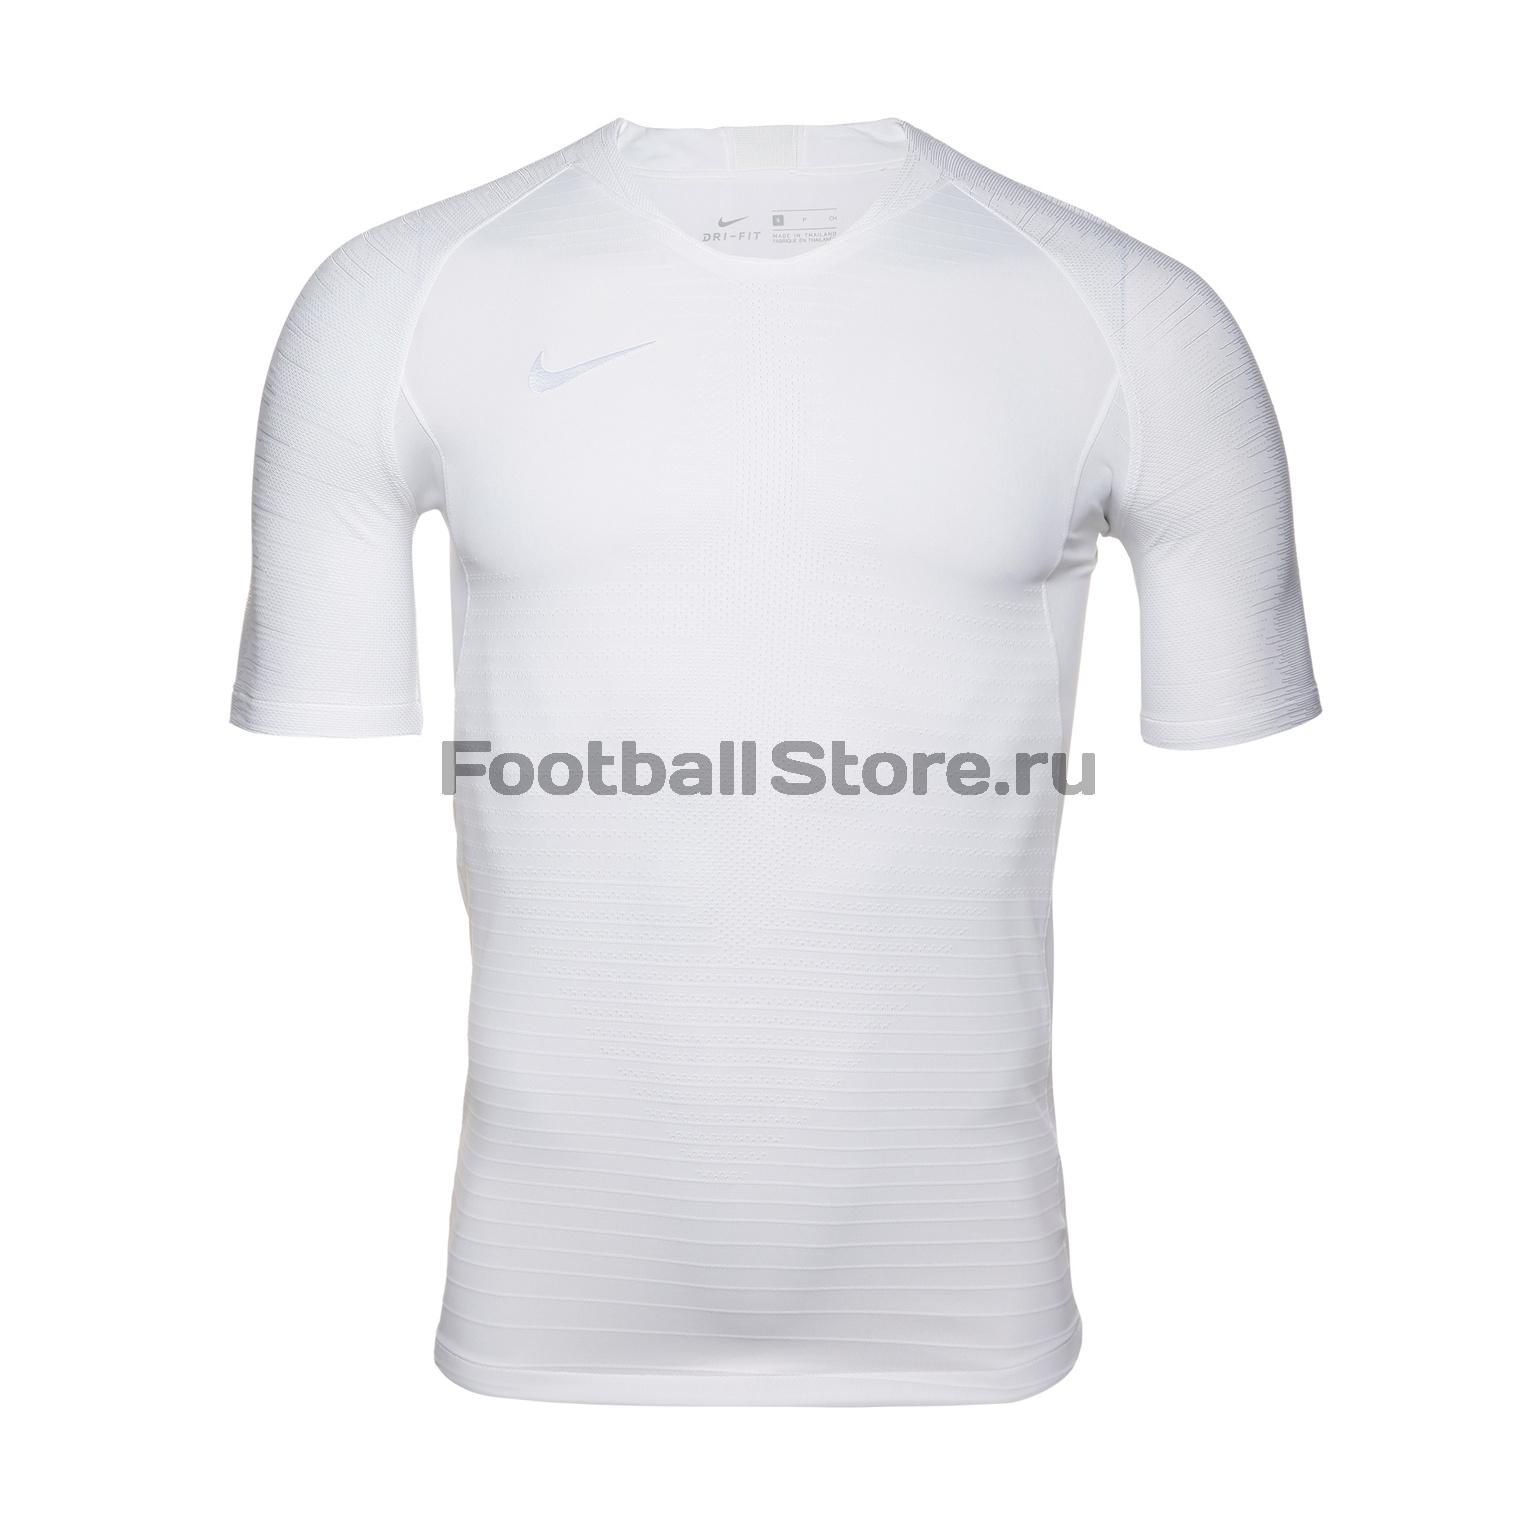 Футболки Nike Футболка Nike VaporKnit Strike Top SS 892887-100 игровая форма nike футболка детская nike ss precision iii jsy boys 645918 410